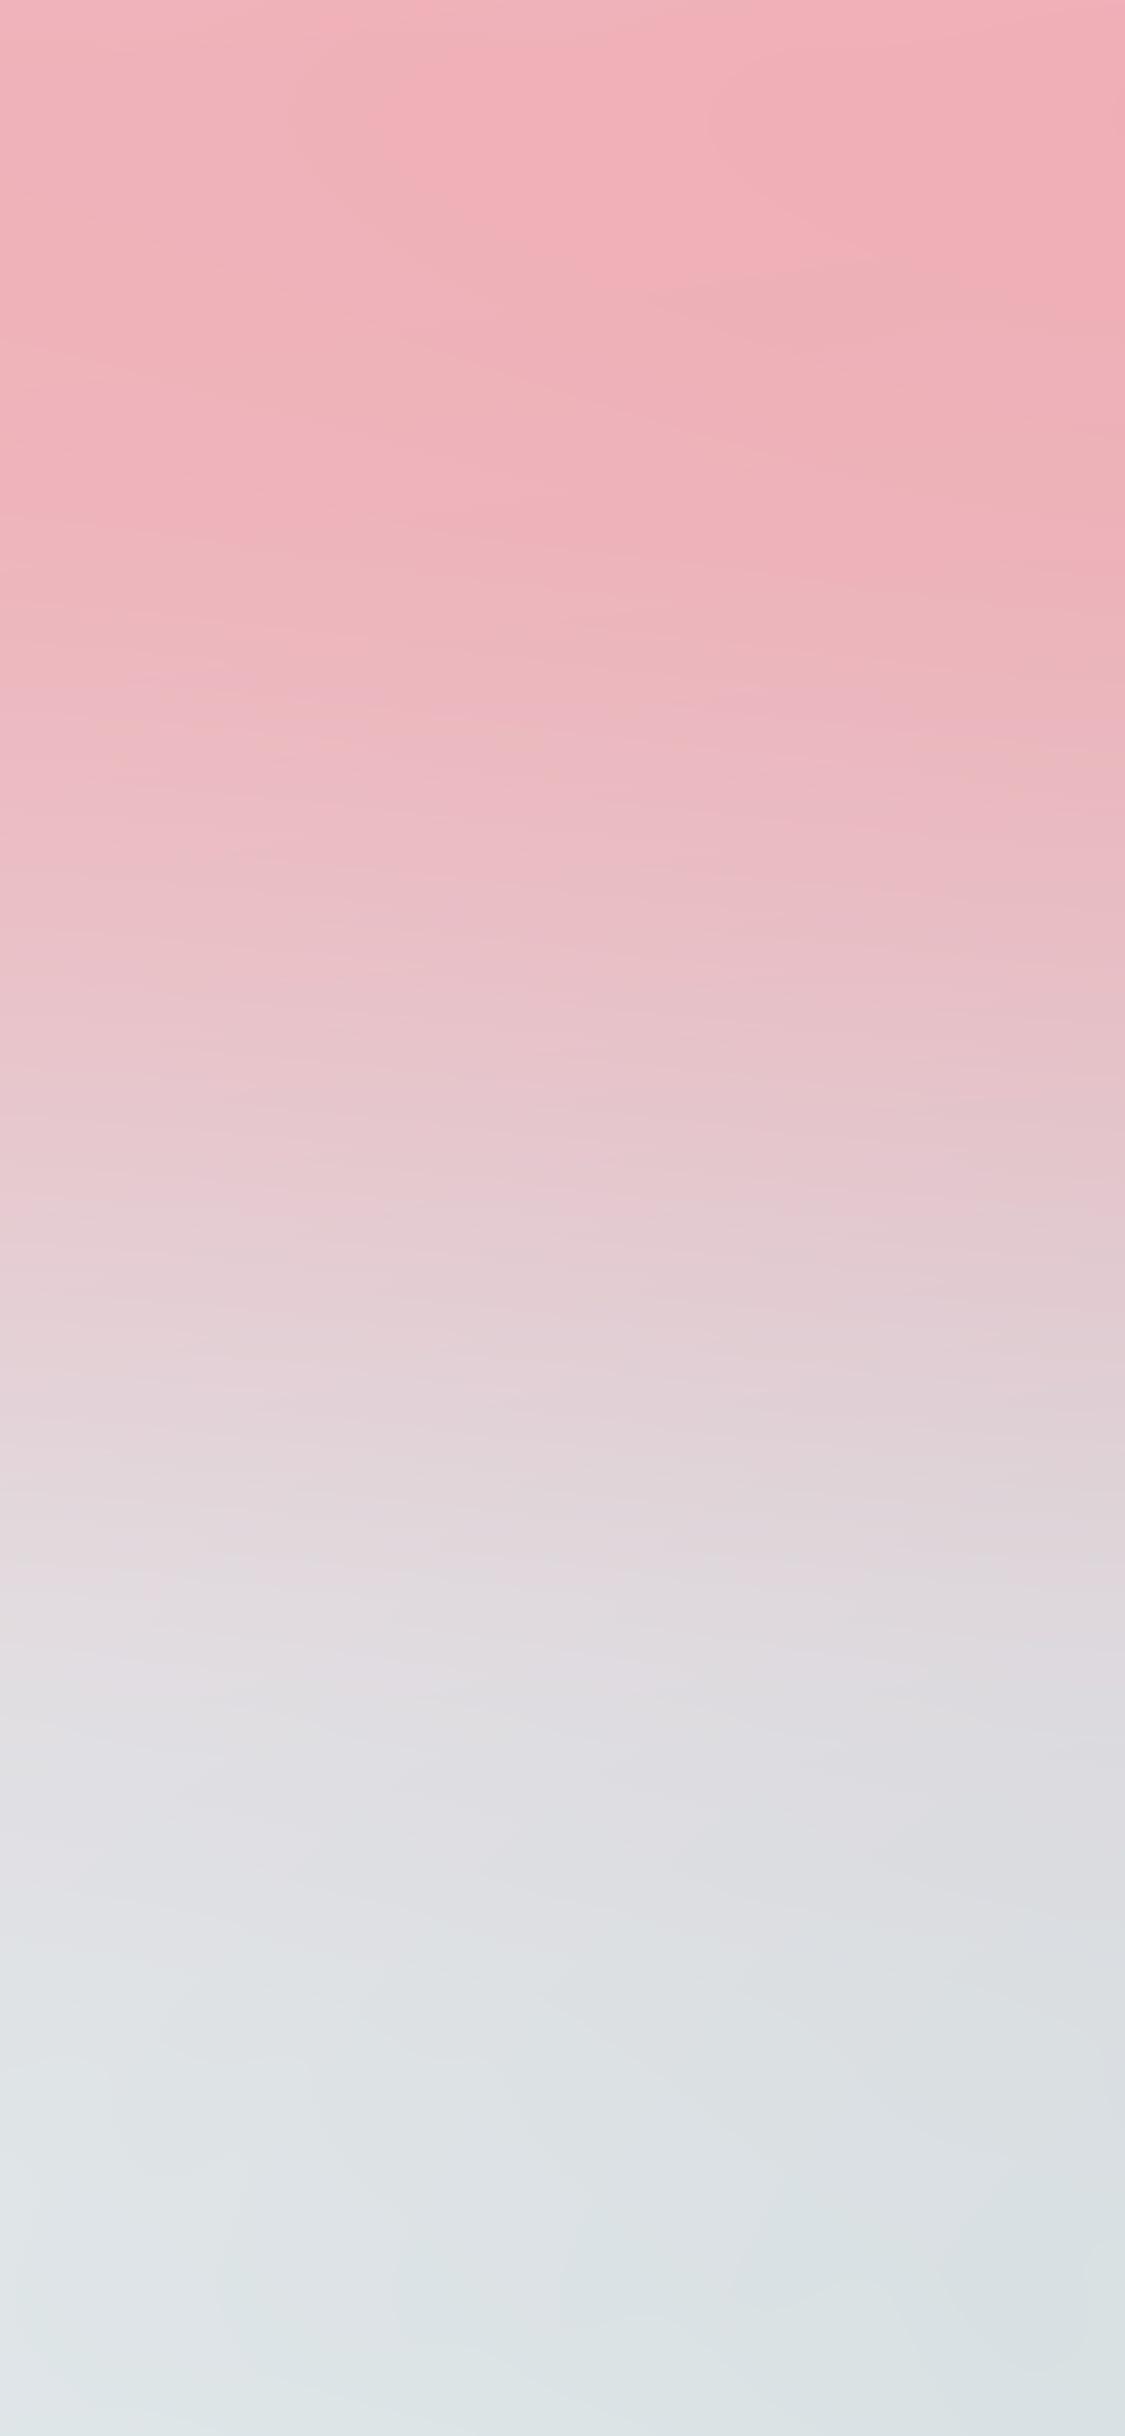 iPhonexpapers.com-Apple-iPhone-wallpaper-sn16-pink-sky-blur-gradation